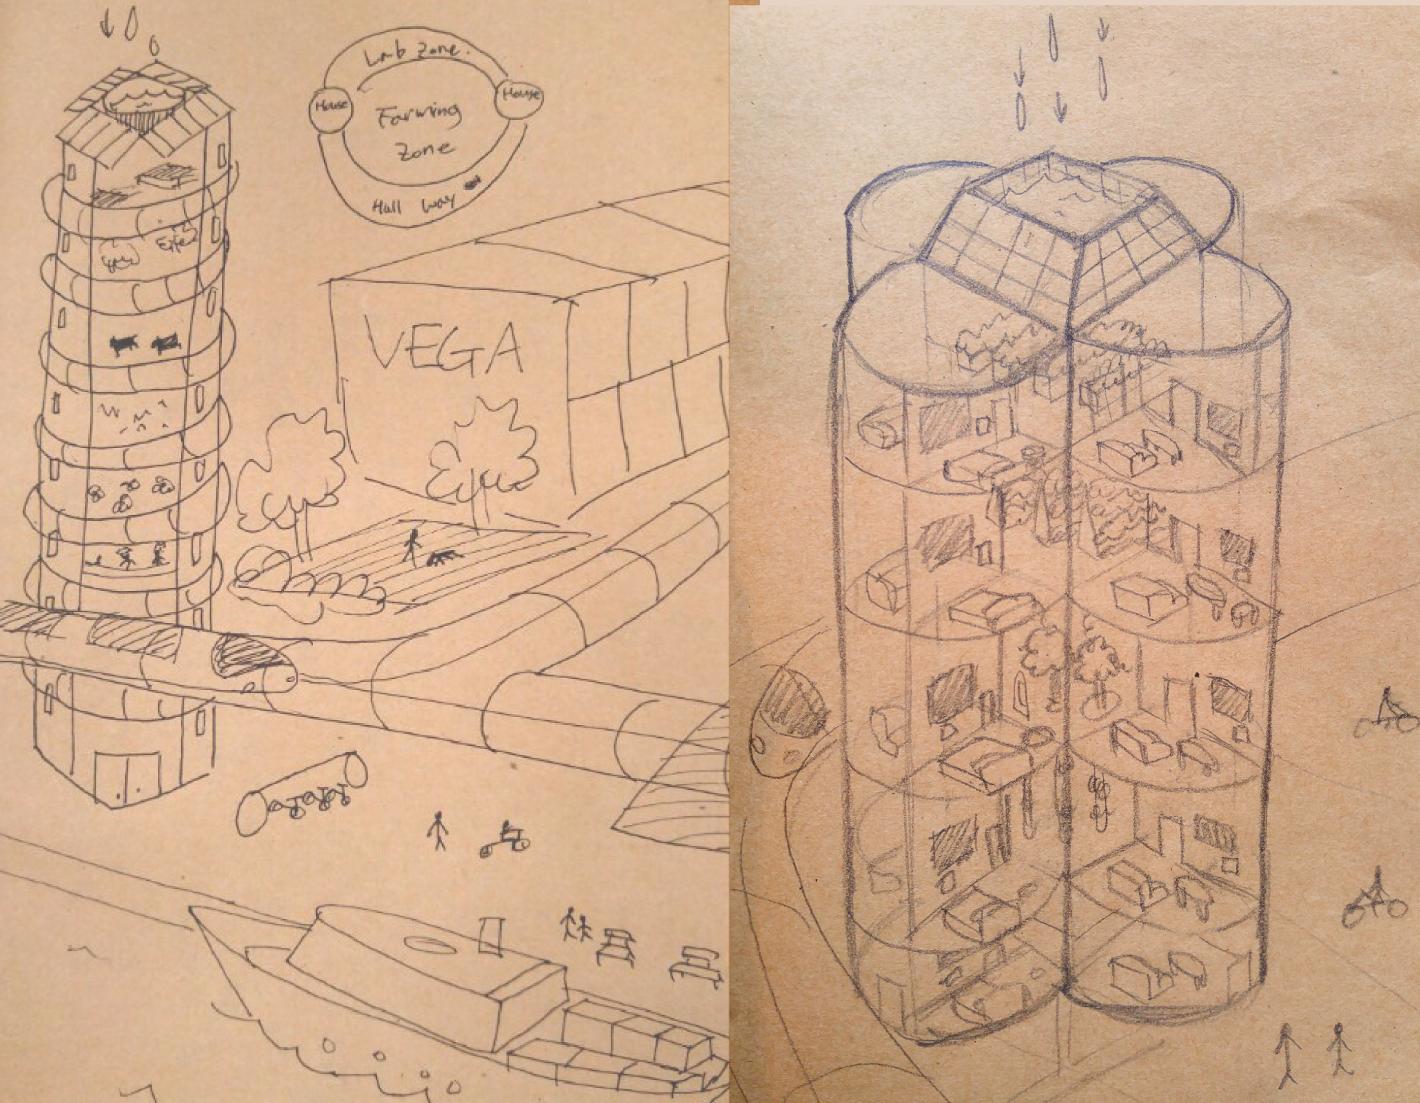 Final sketch design concept